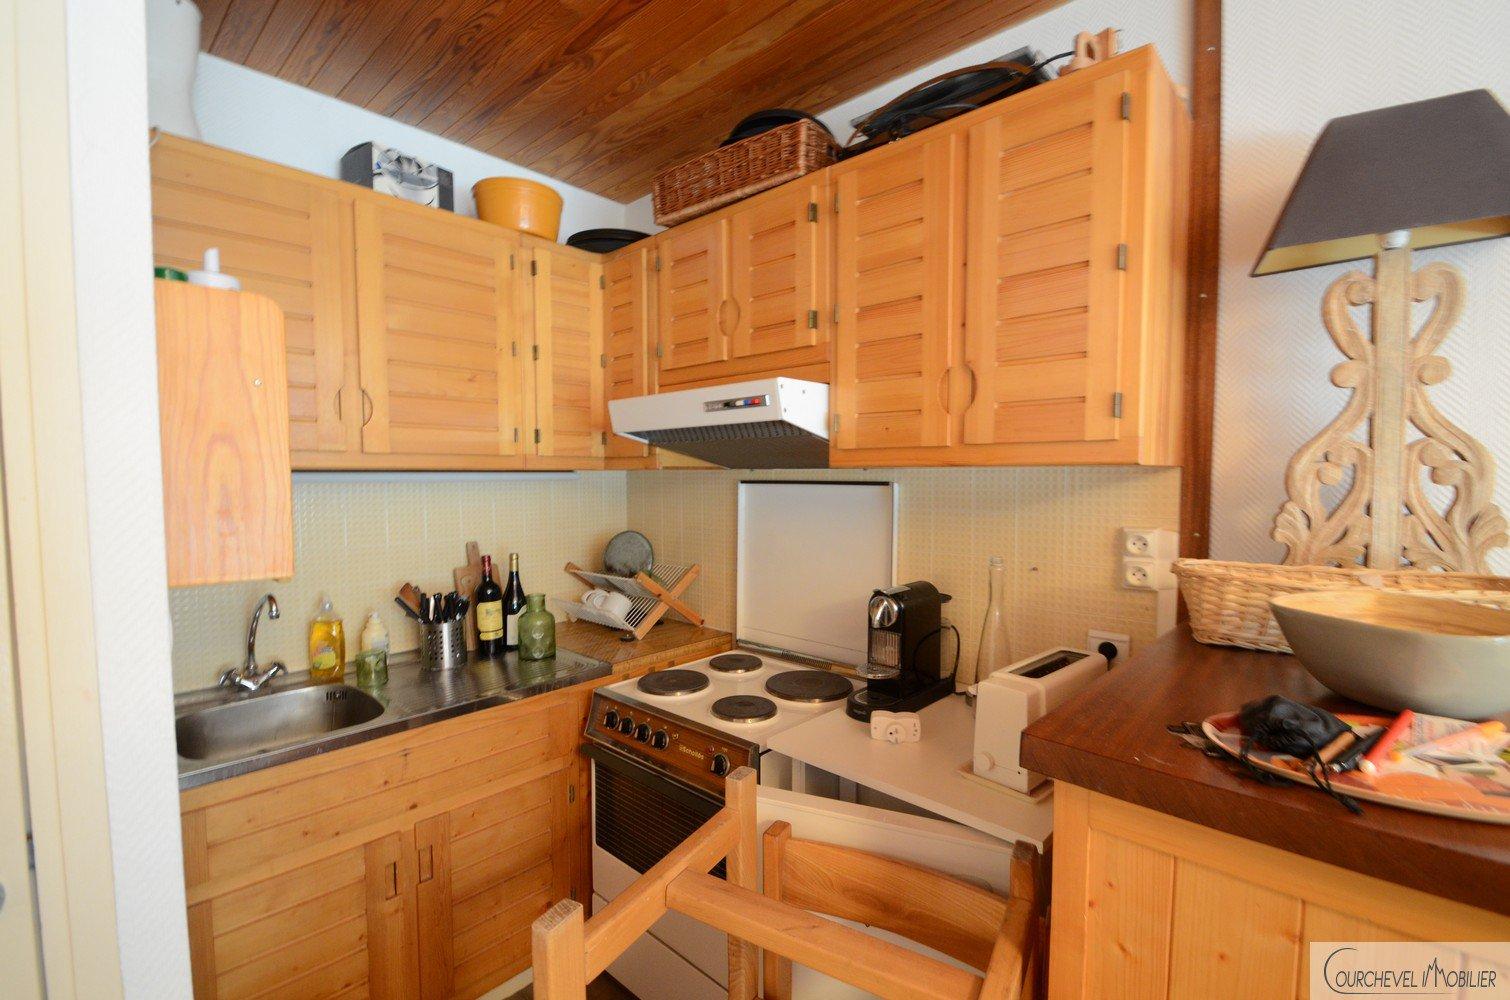 Pleasant apartment - Courchevel Moriond